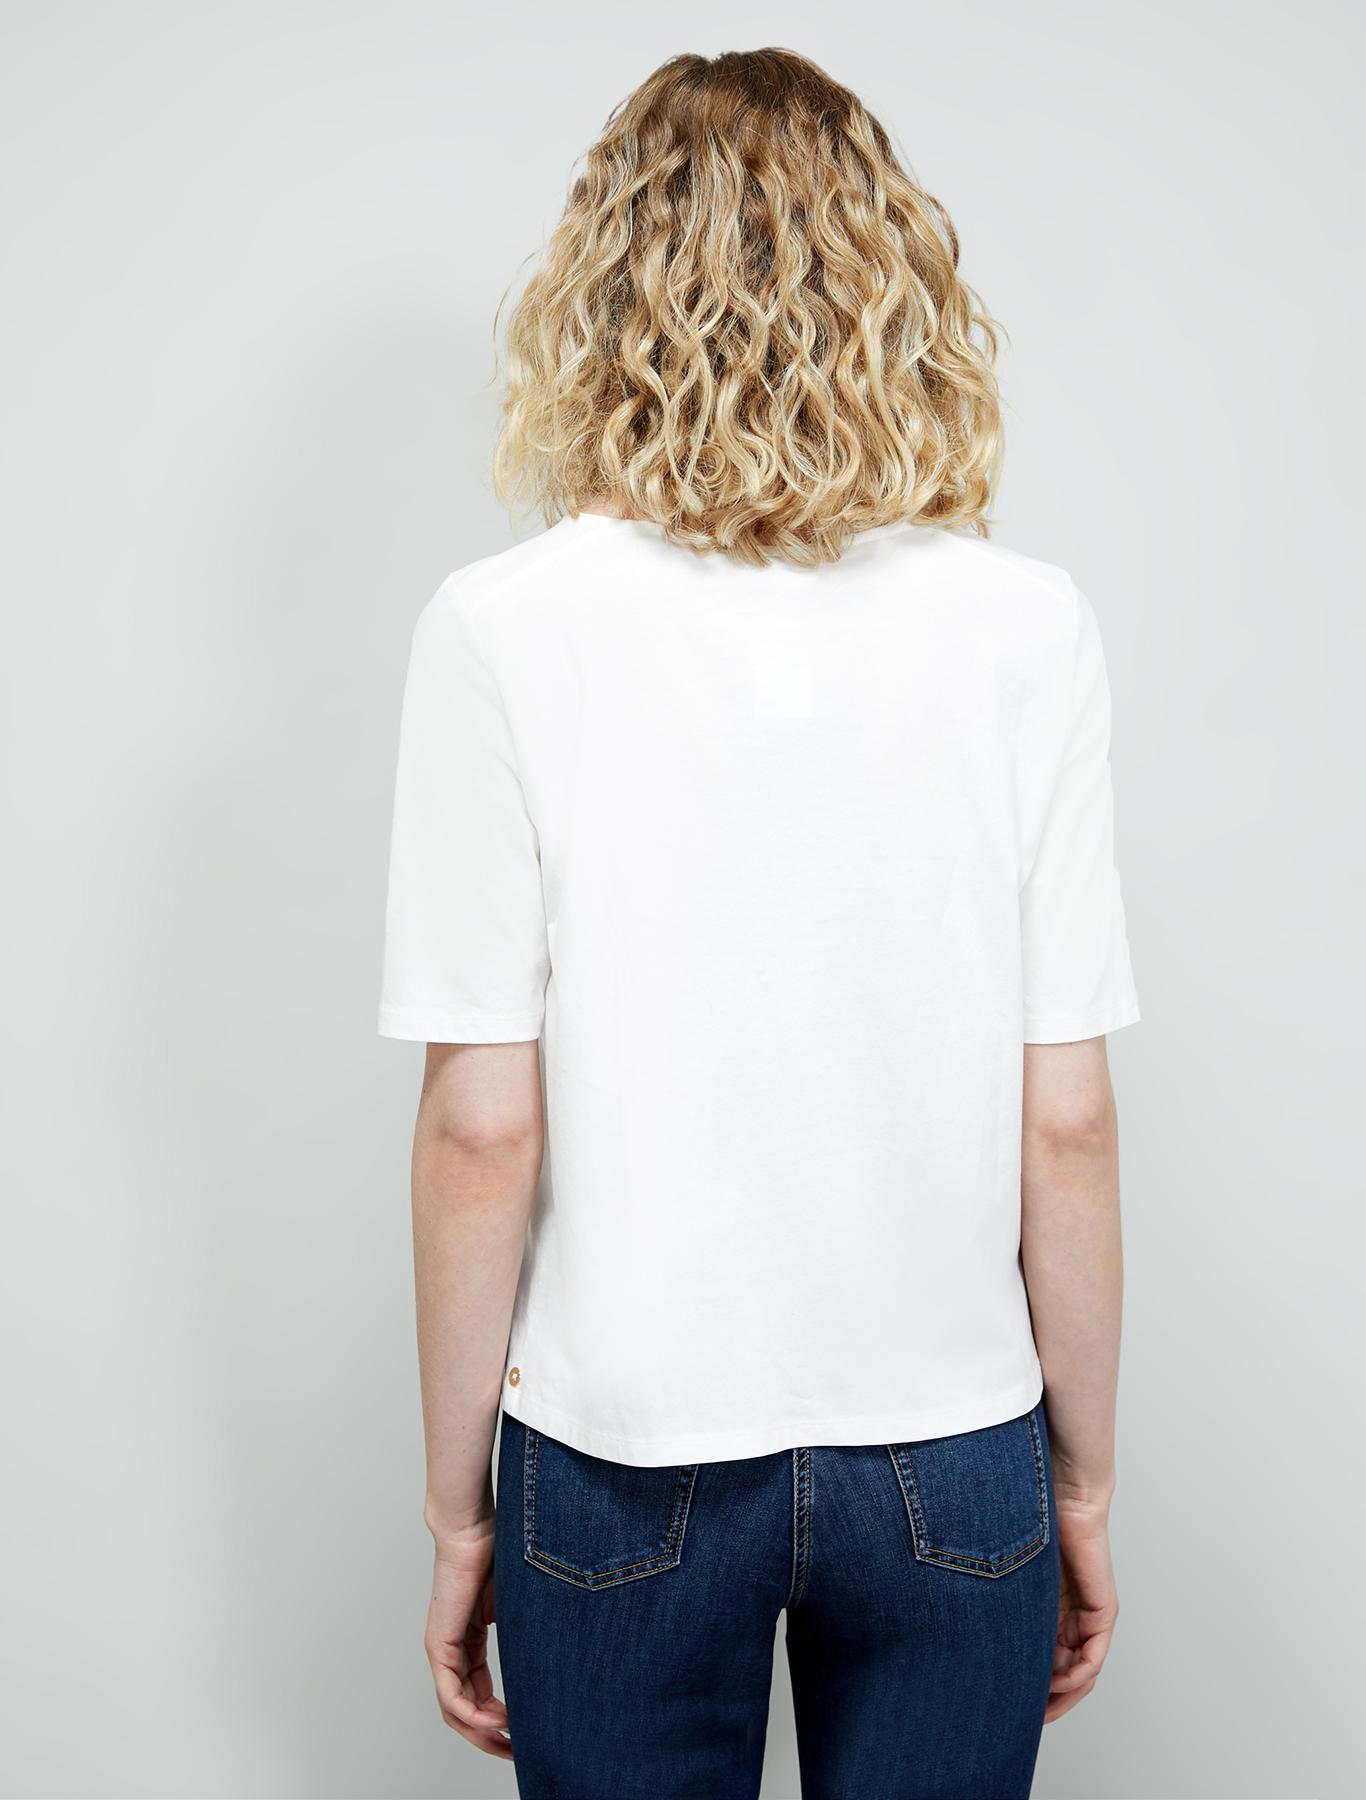 Sparkling cotton T-shirt - ivory - pennyblack